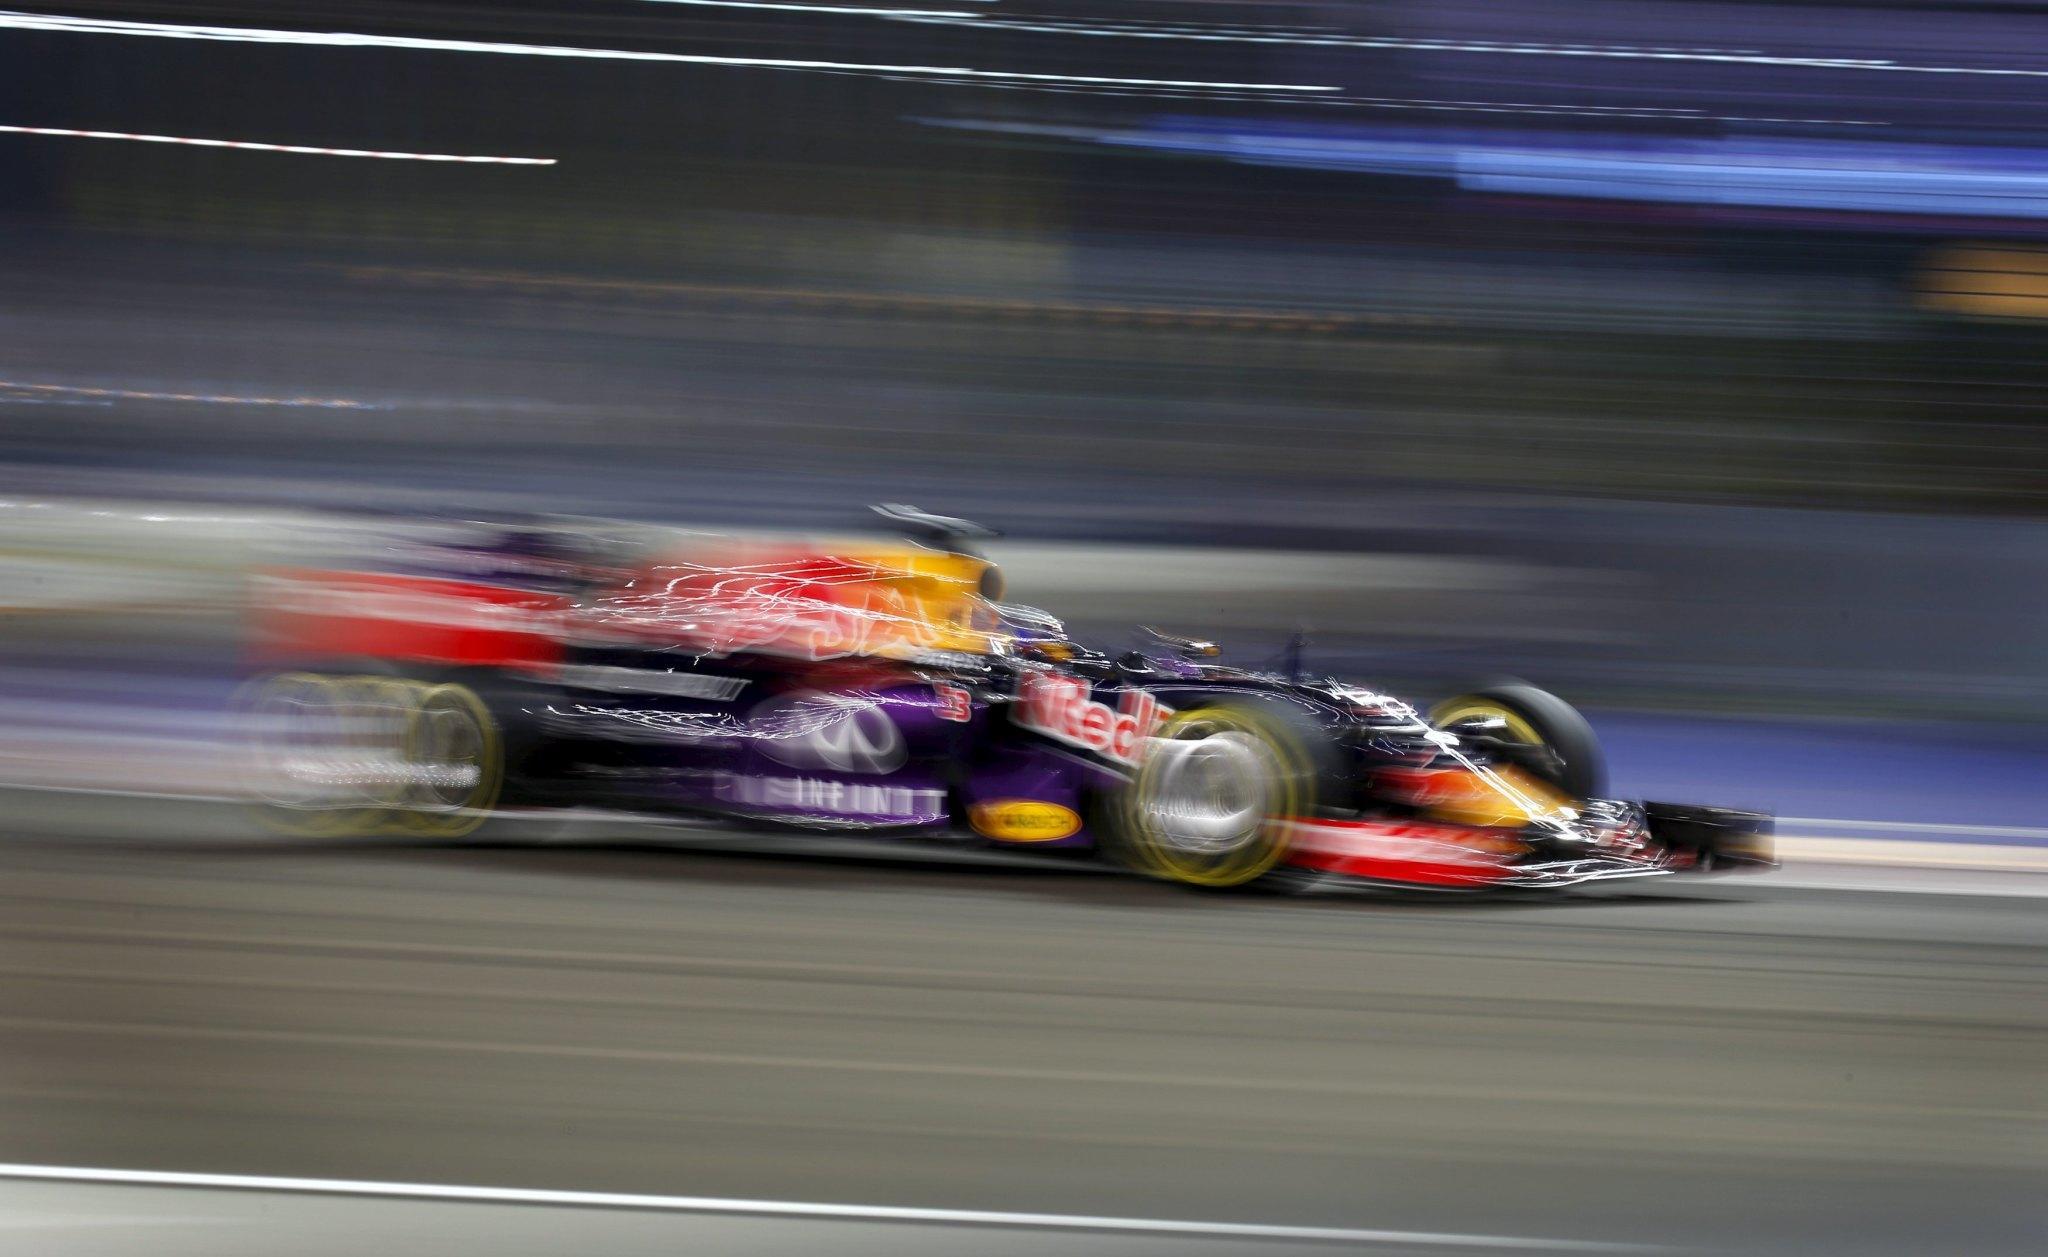 singapur qualifying